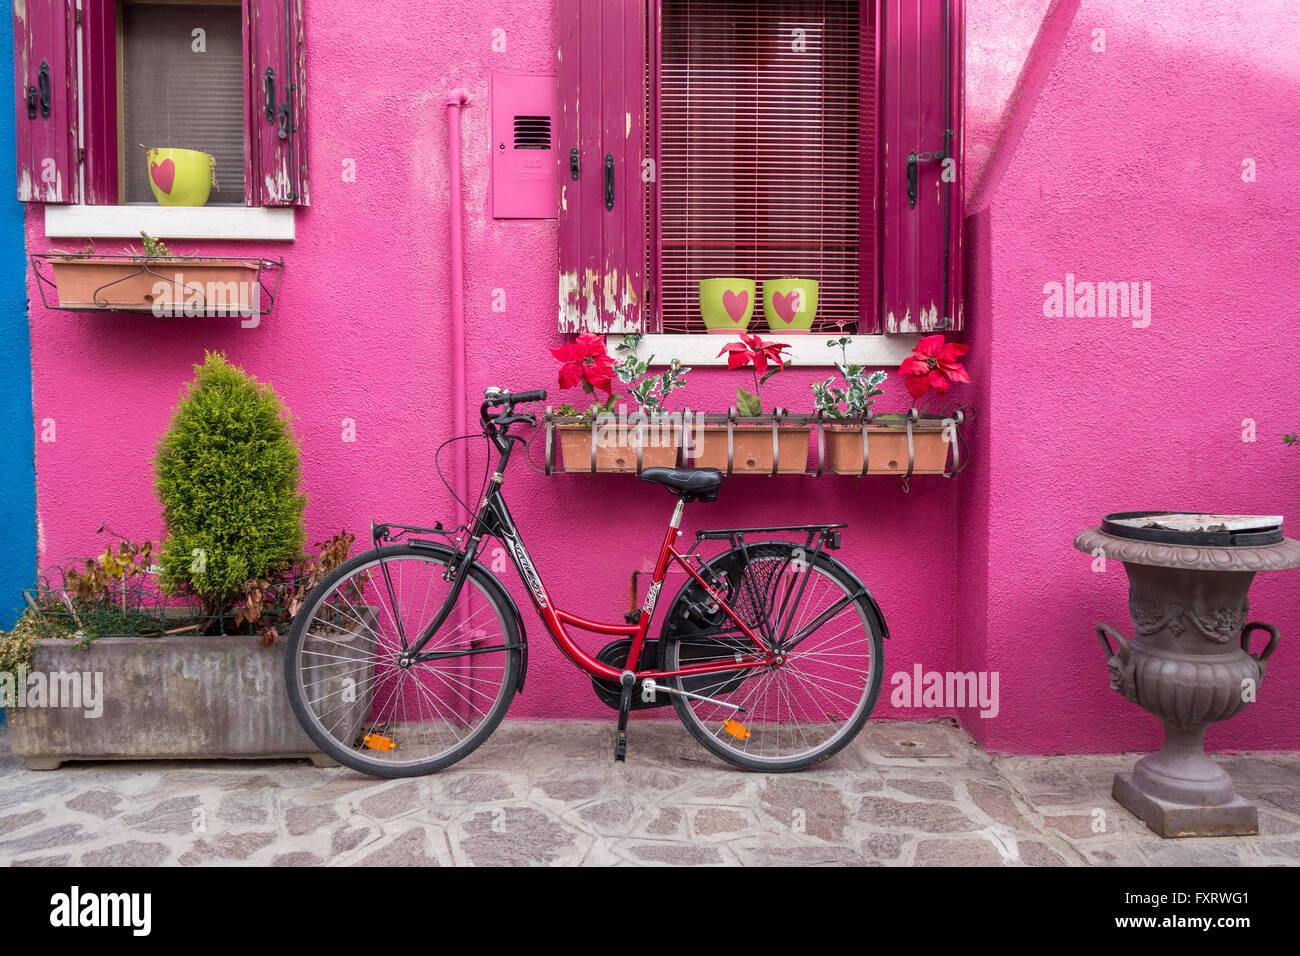 Venedig - Insel Burano bunt bunt Rosa Haus mit dem Fahrrad Stockbild